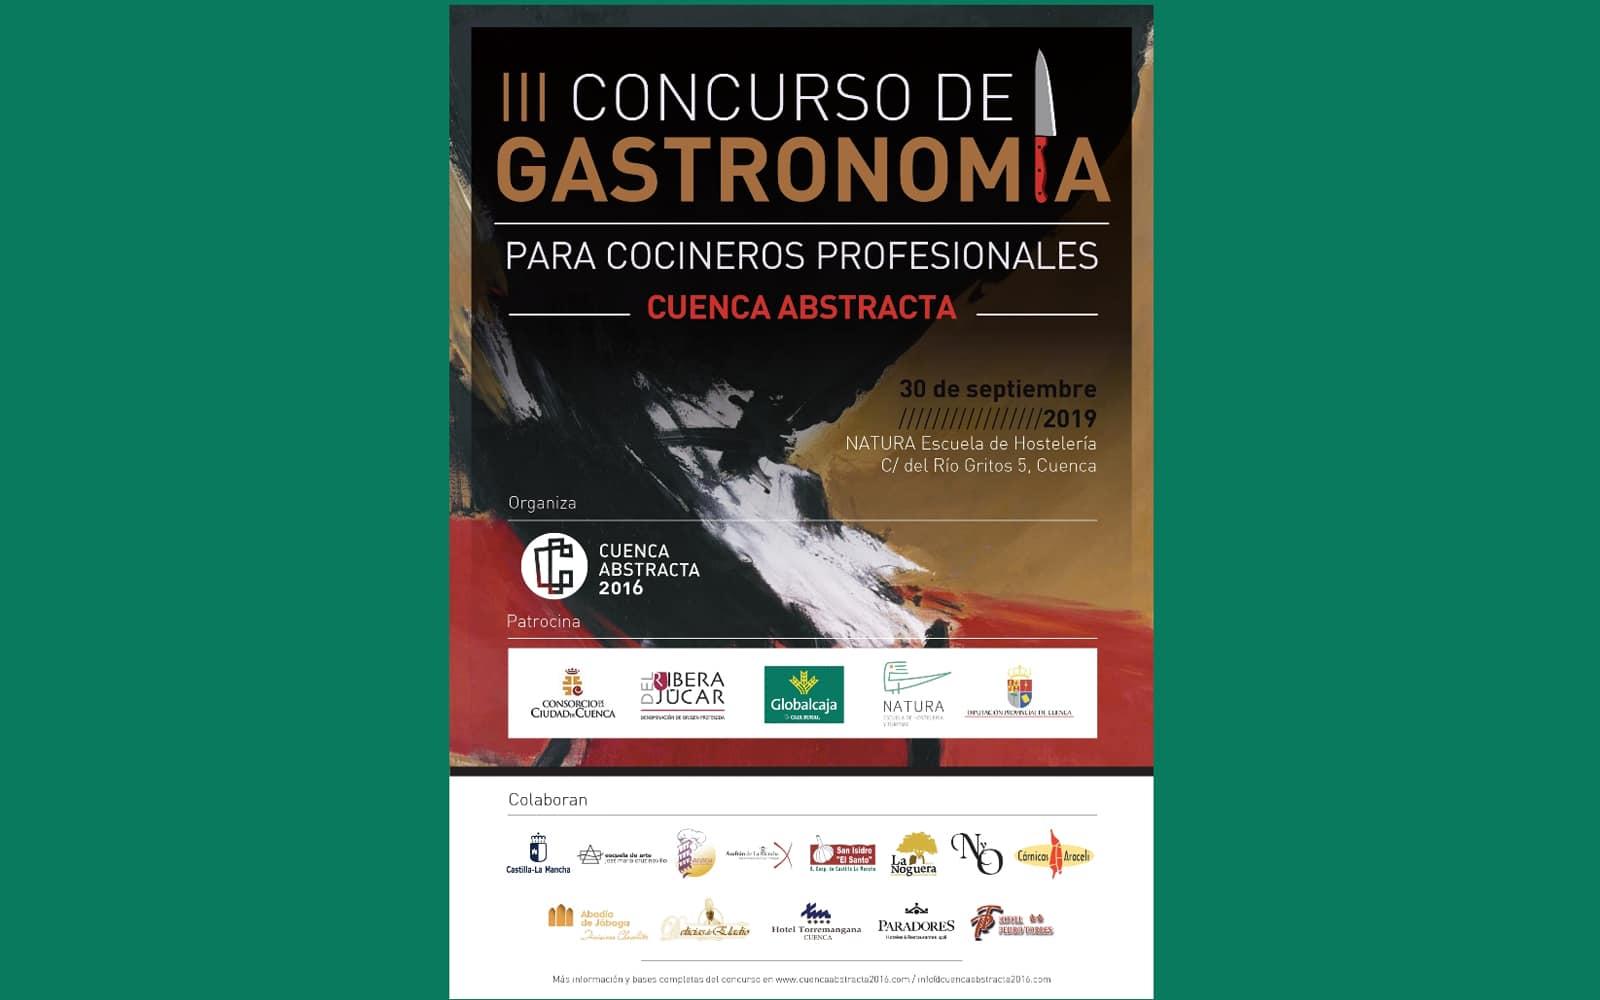 https://blog.globalcaja.es/wp-content/uploads/2019/08/CARTEL_W-para-noticias.jpg